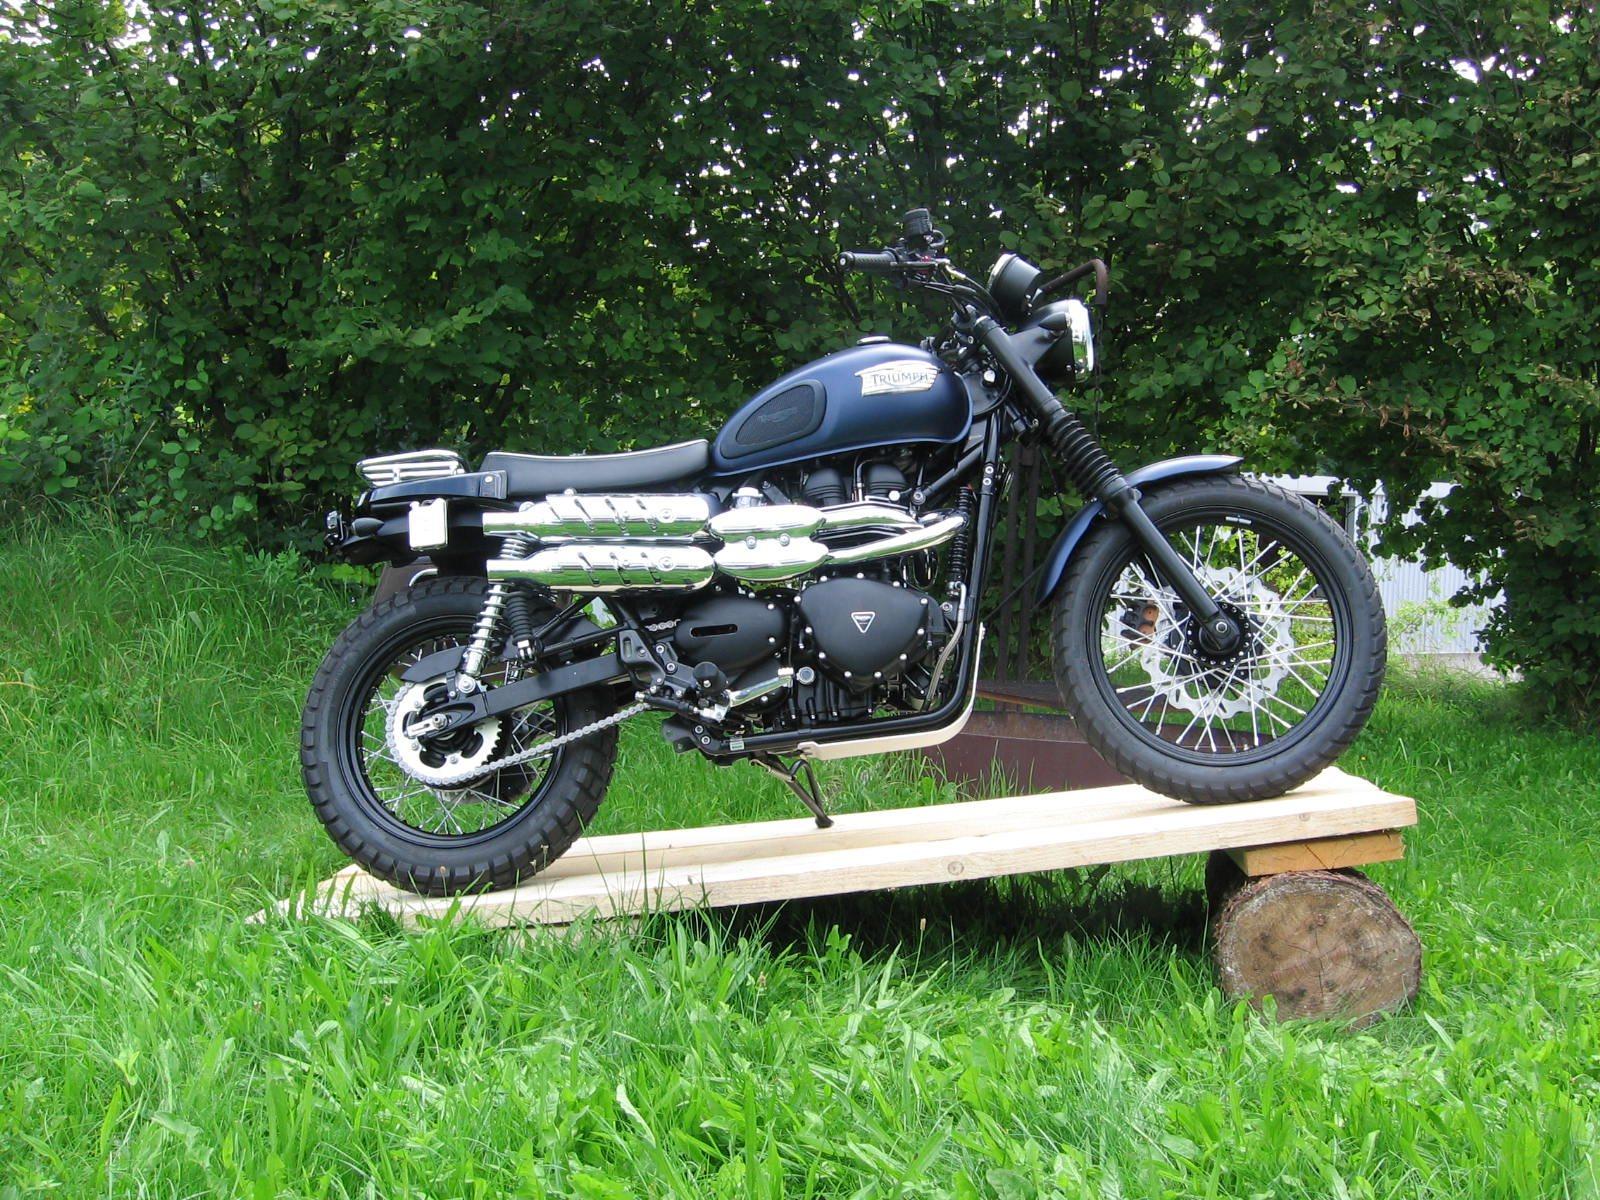 umgebautes motorrad triumph scrambler von sbf triumph bikes parts gmbh co kg. Black Bedroom Furniture Sets. Home Design Ideas